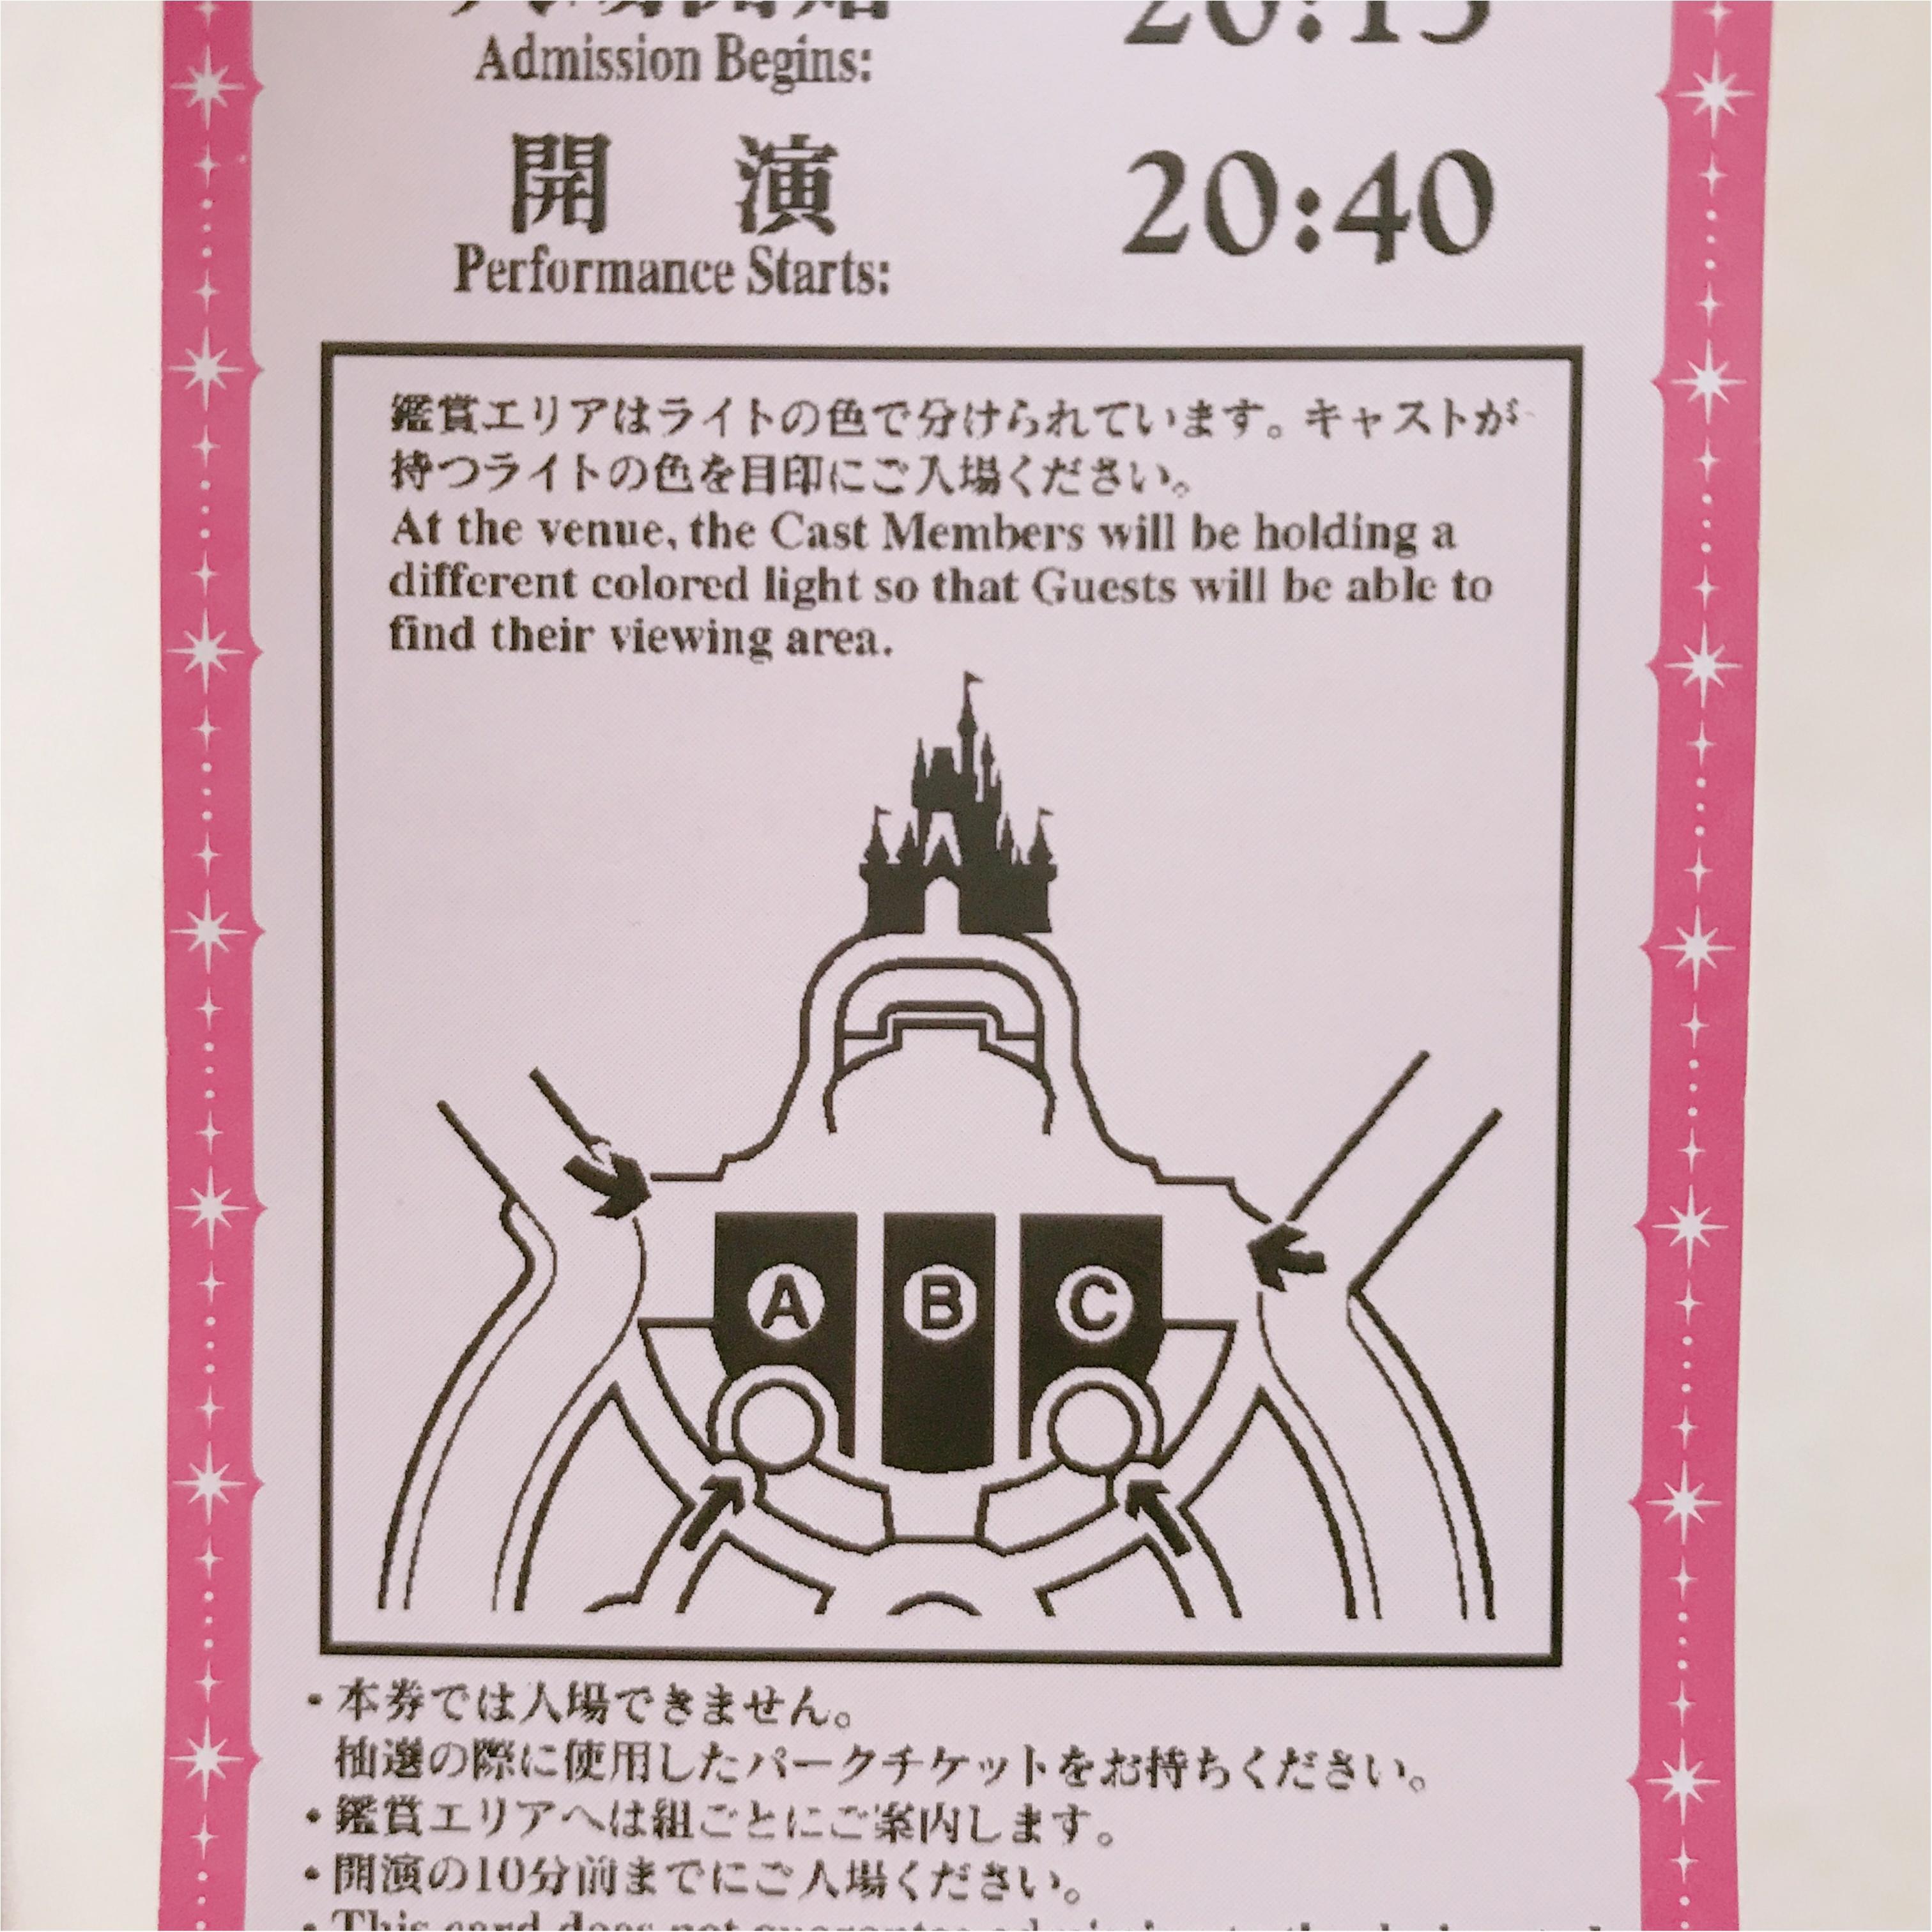 【Celebrate!Tokyo Disneyland】に当選したら絶対に知っておくべきポイントとは❤︎_3